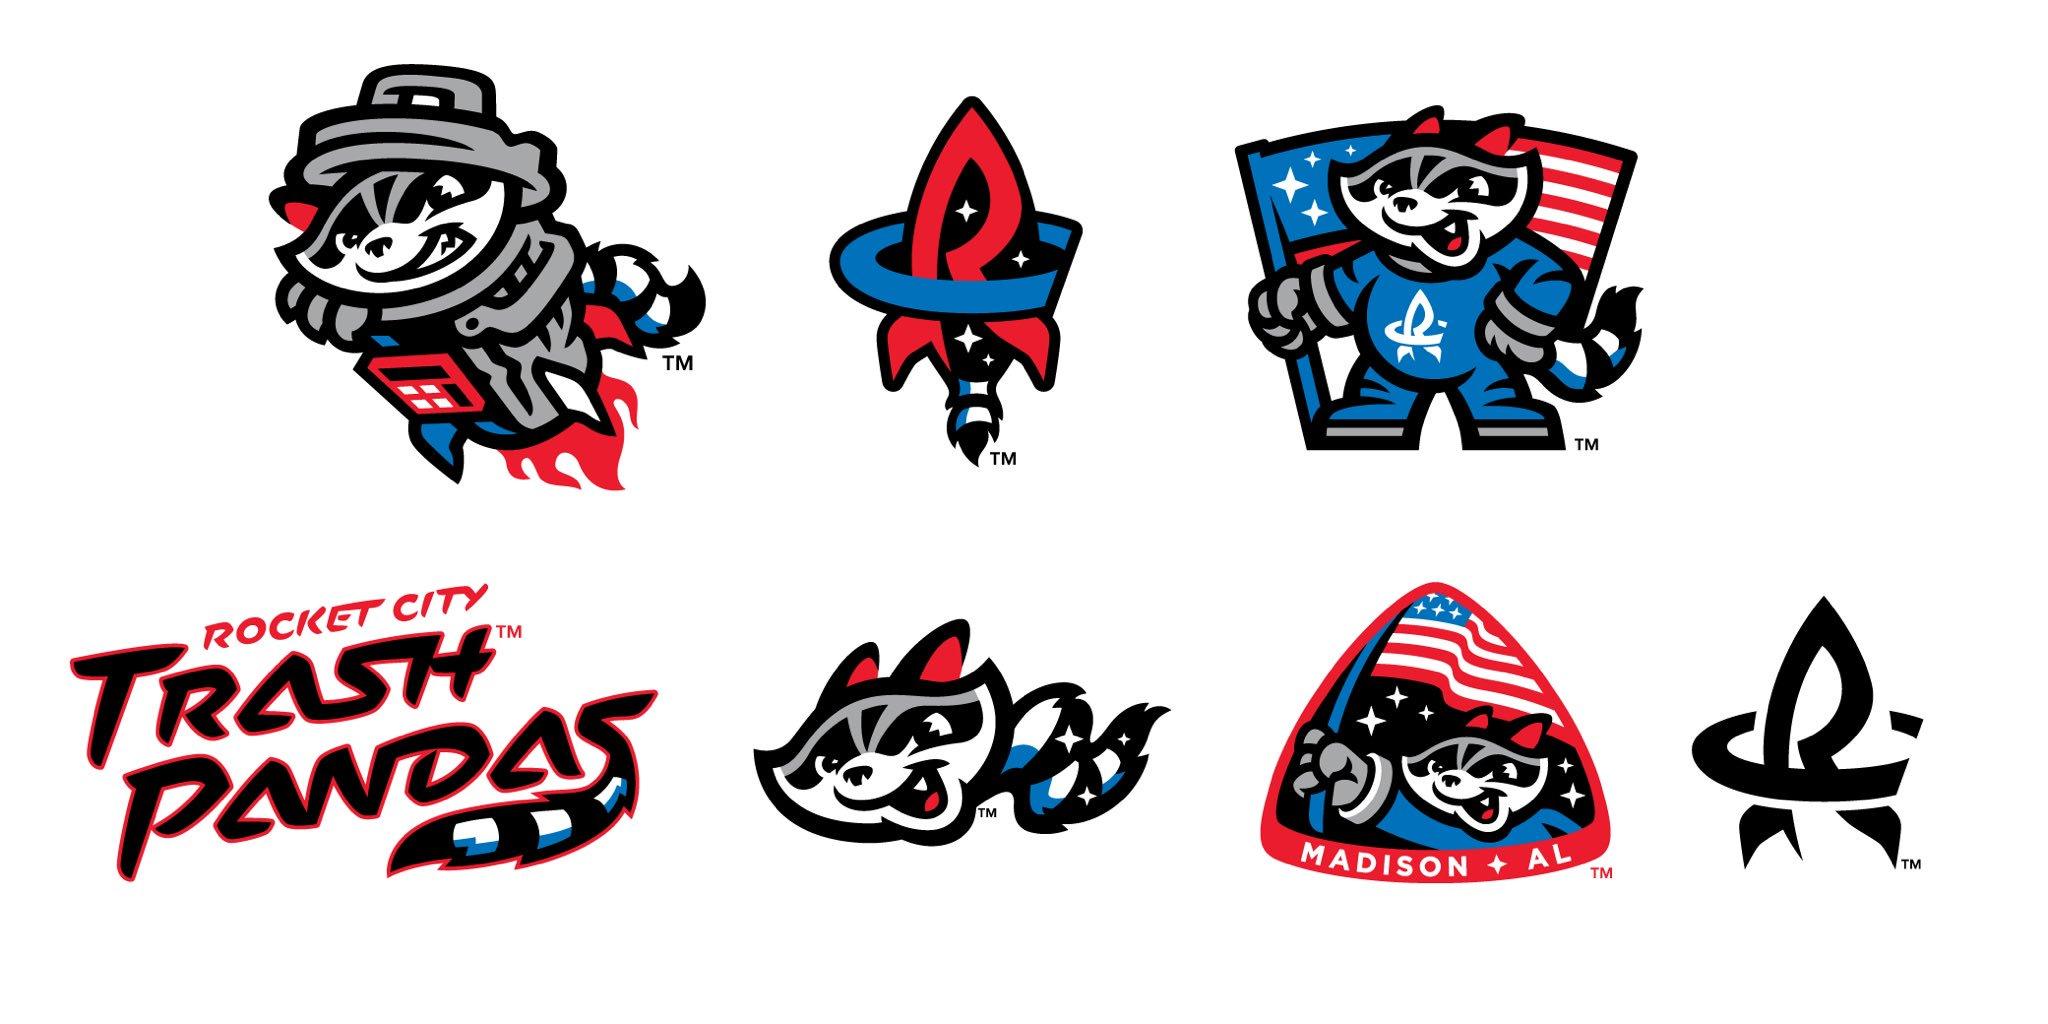 Rocket City Trash Pandas Logos Unveiled.